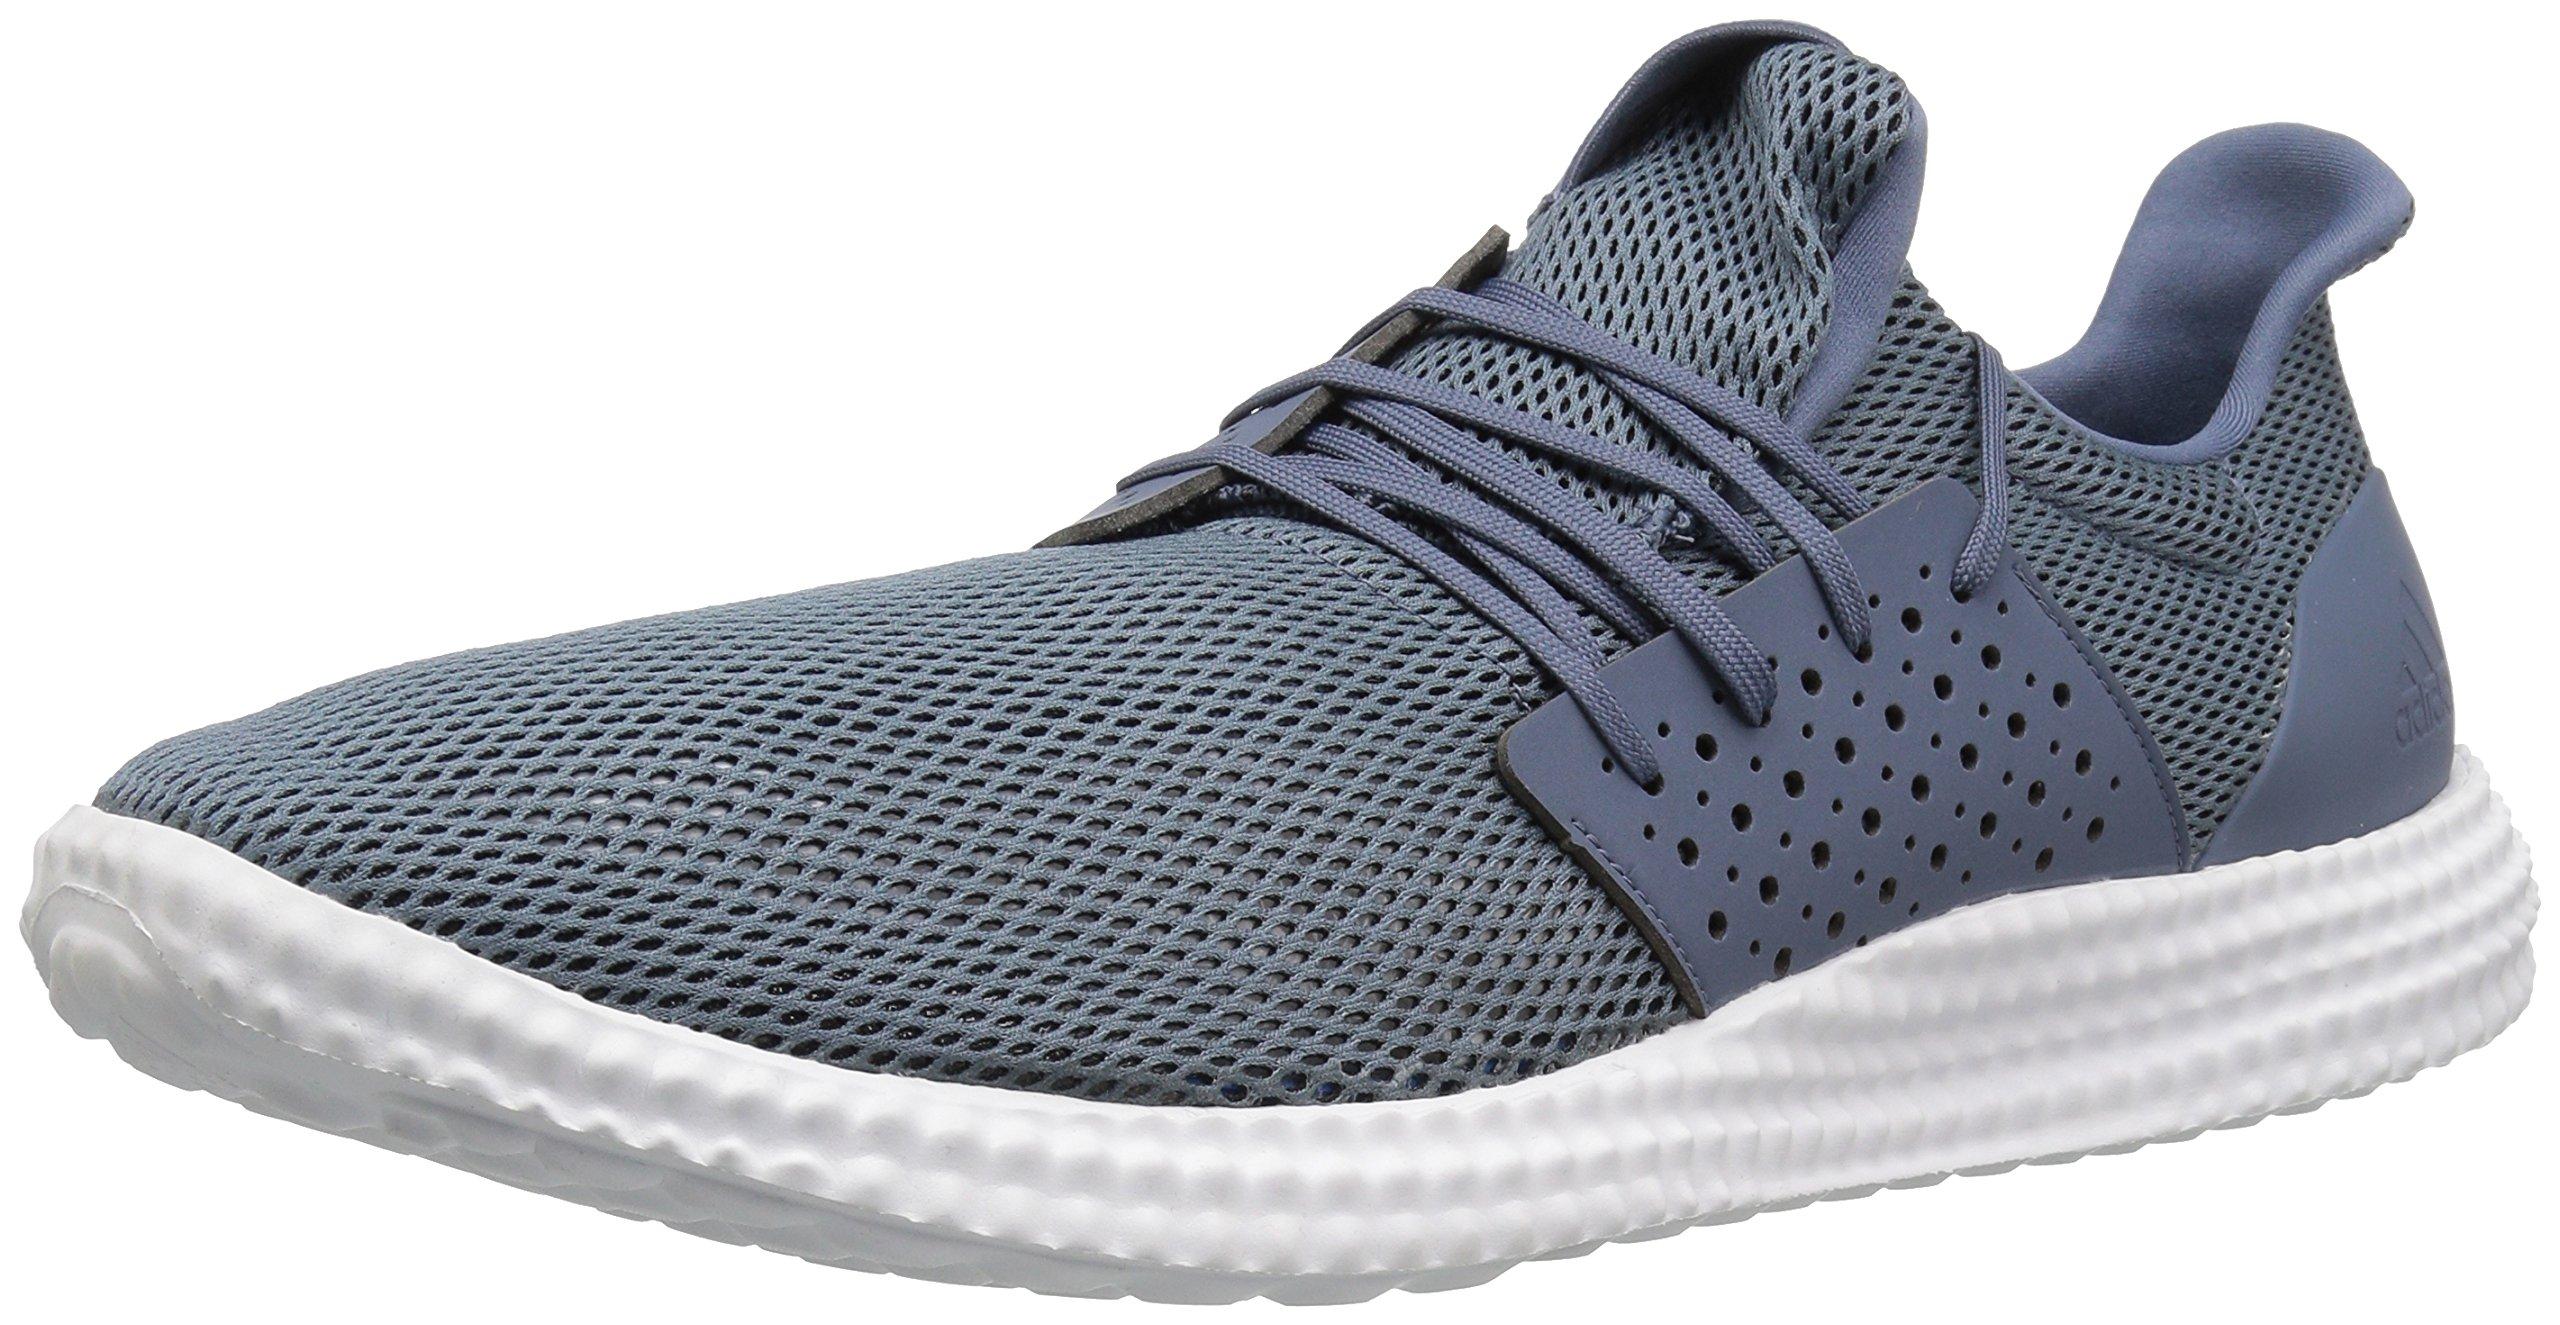 adidas Athletics 24/7 TR M Cross Trainer, Raw Steel/Raw Steel/Core Black, 13 M US